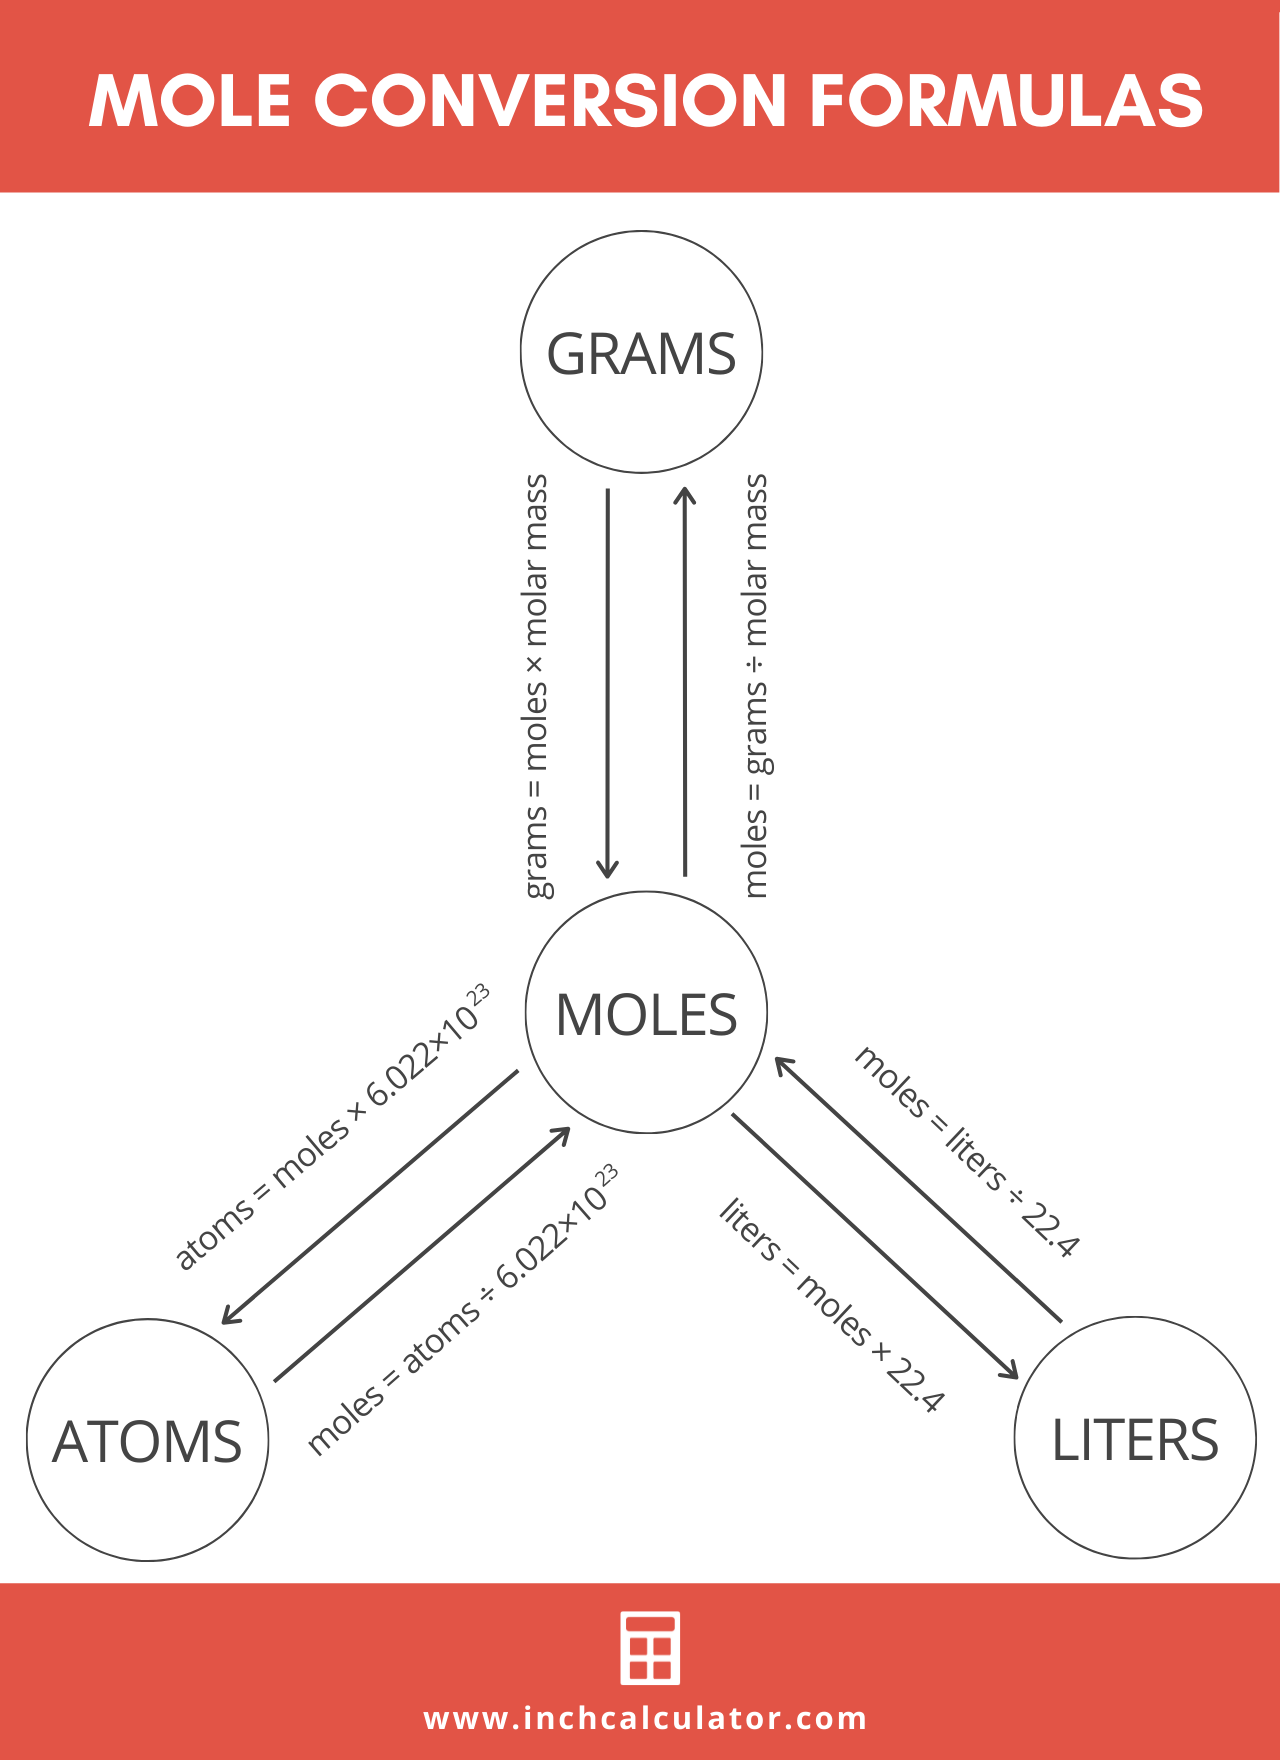 infographic showing six different mole conversion formulas